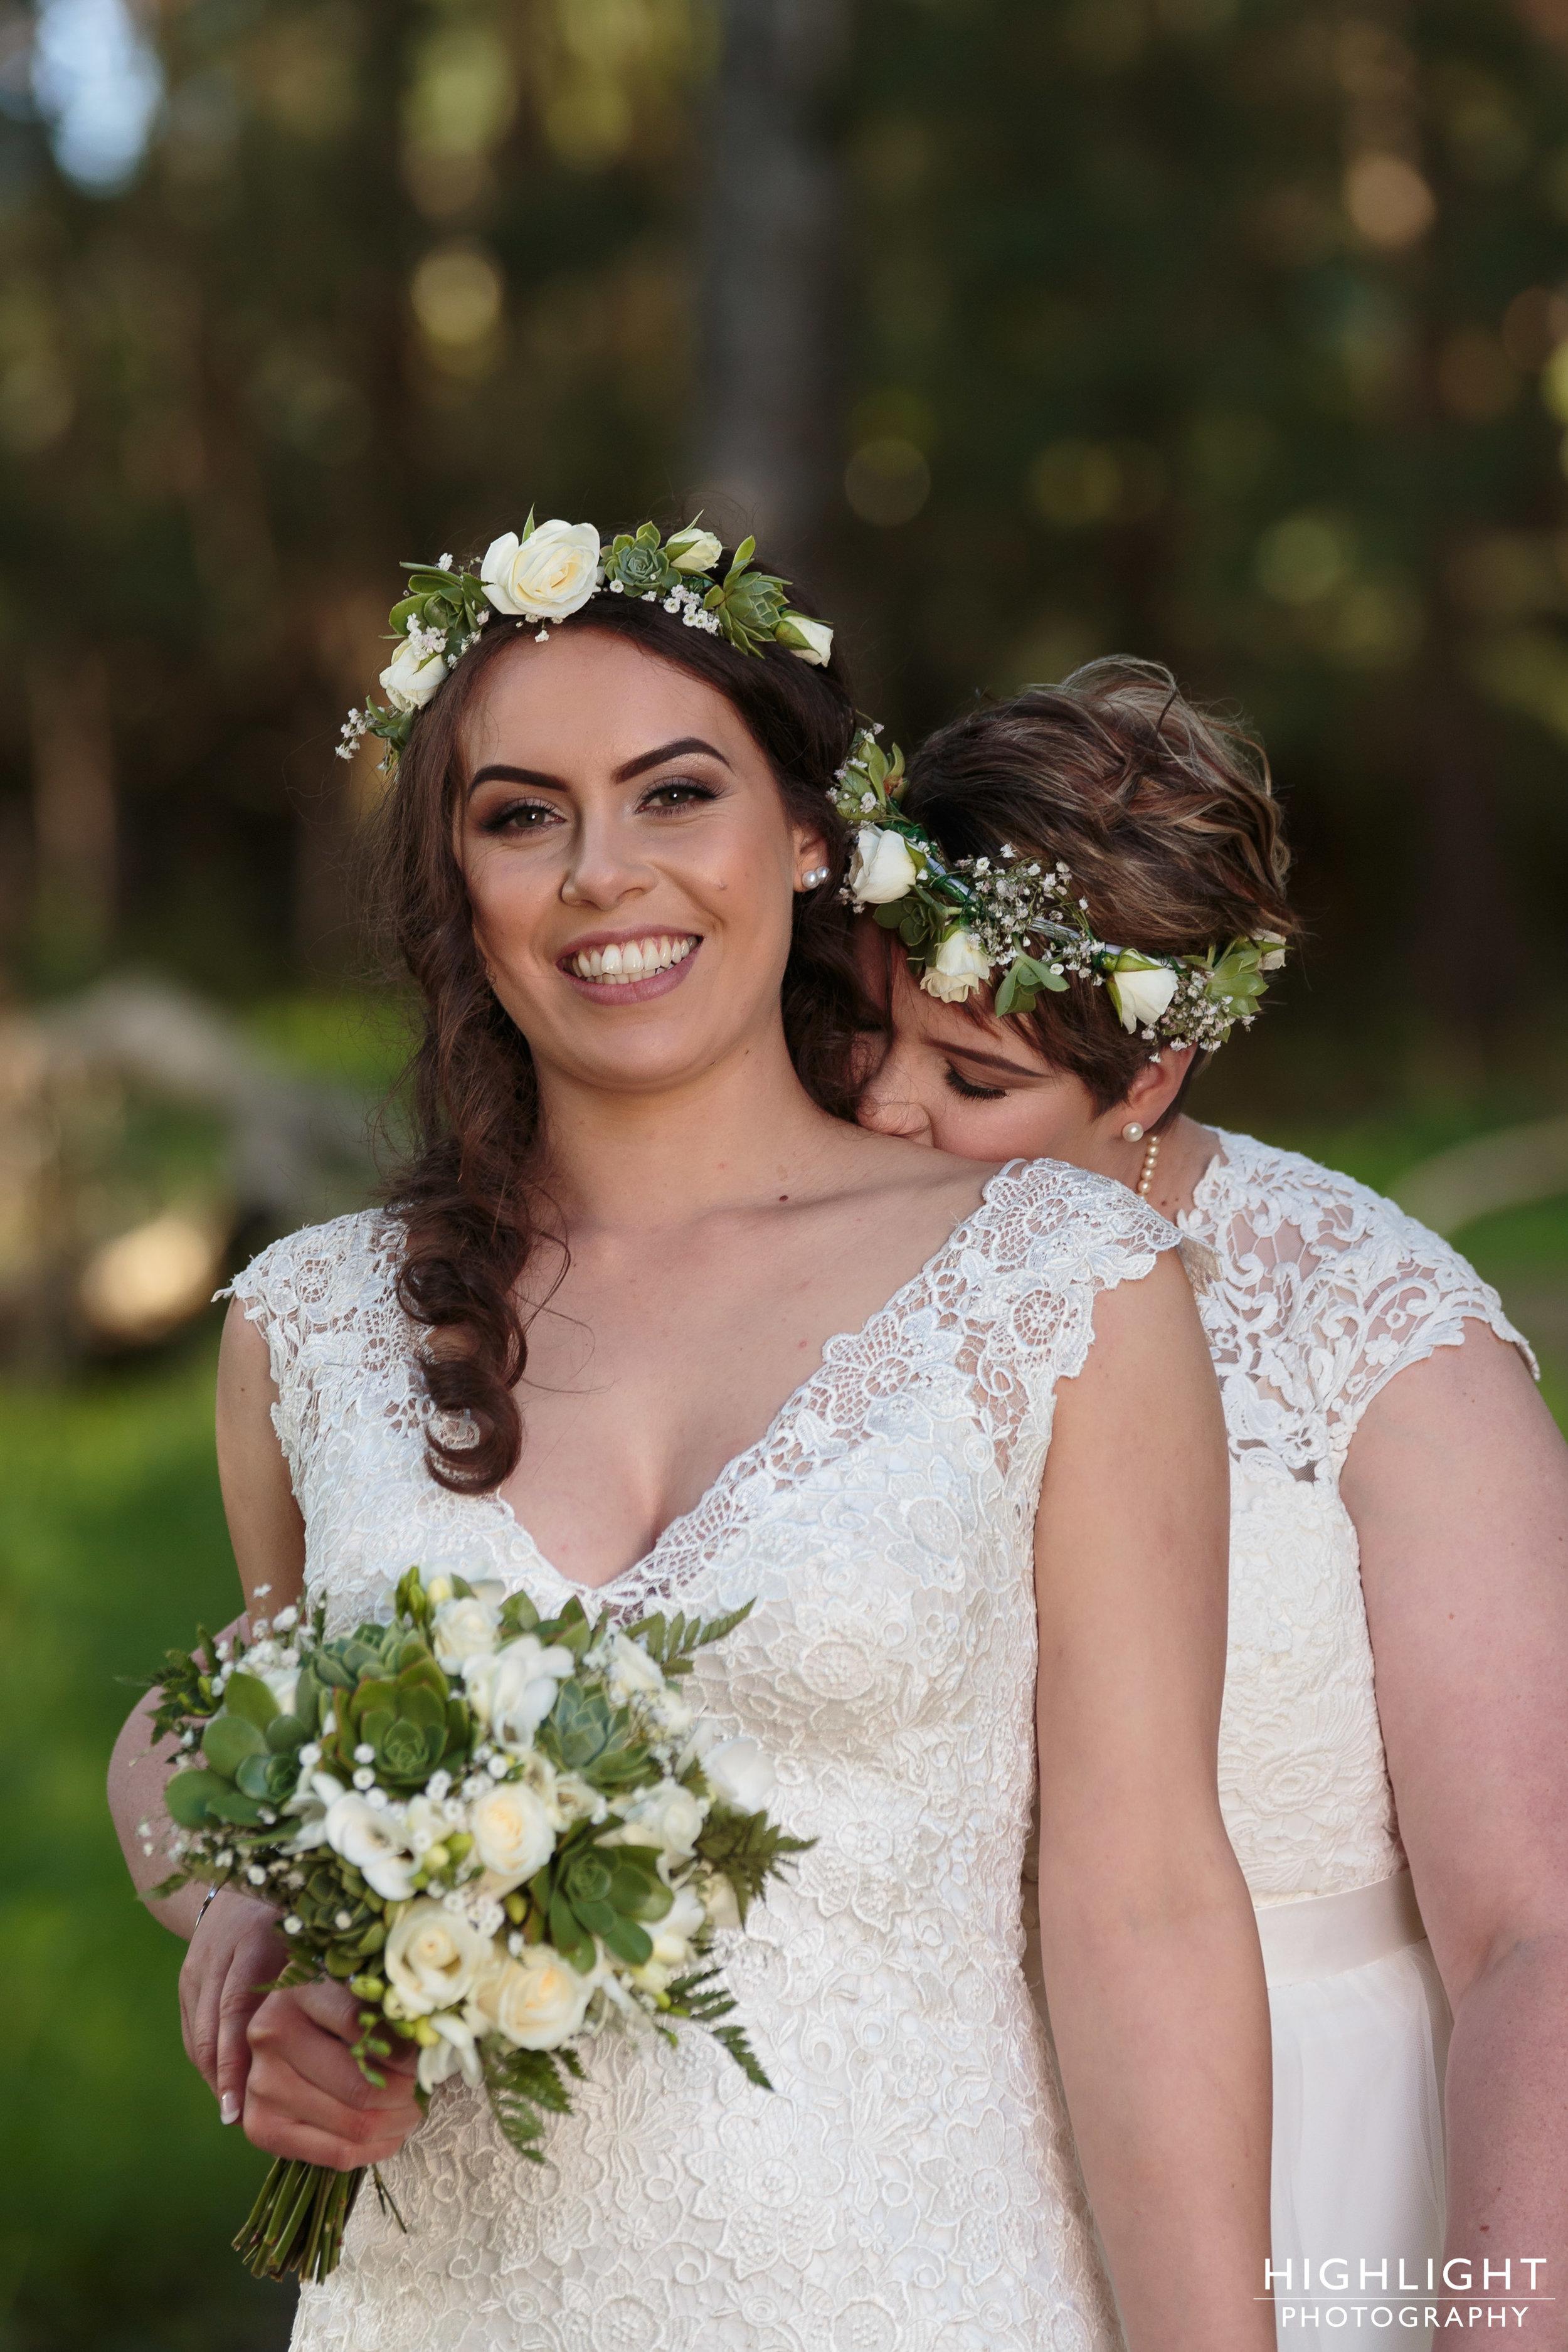 highlight_wedding_photography_makoura_lodge_manawatu_new_zealand-127.jpg